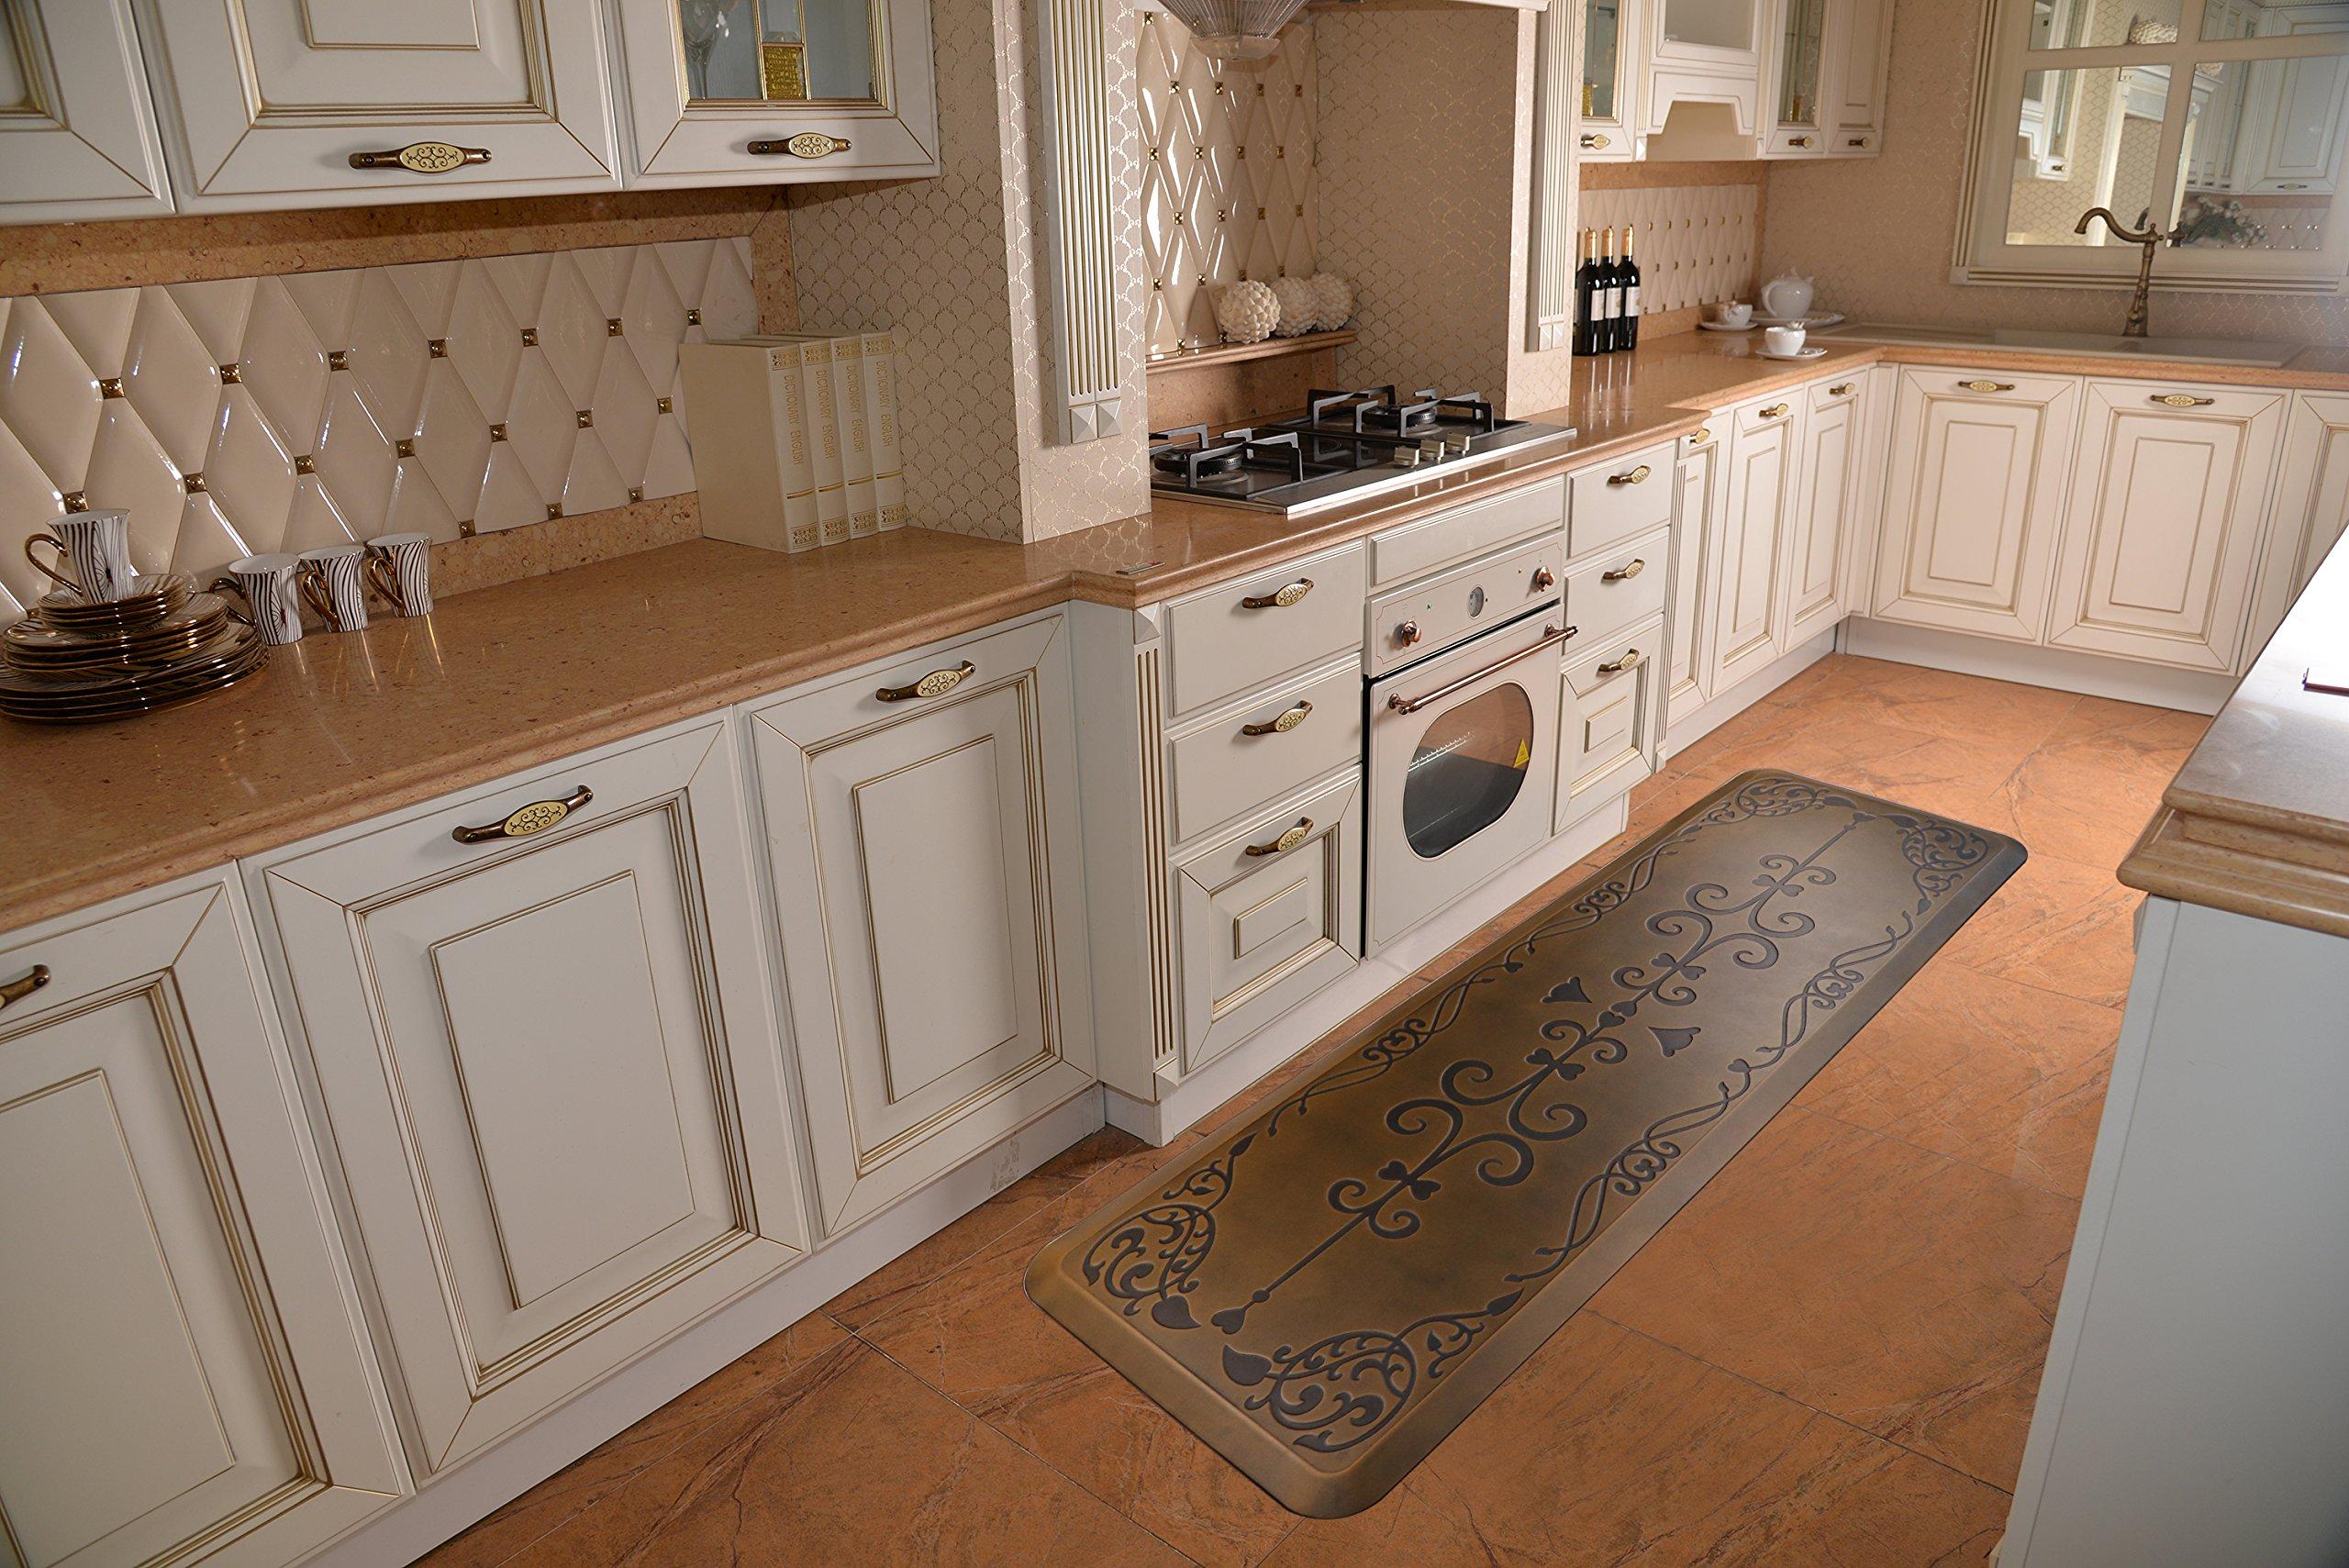 AMCOMFY Kitchen Anti Fatigue Mat,Comfort Floor Mats,Standing Desk Mats,Antique Series (24''x70''x3/4'', Love Flower Brown) by Amcomfy (Image #4)